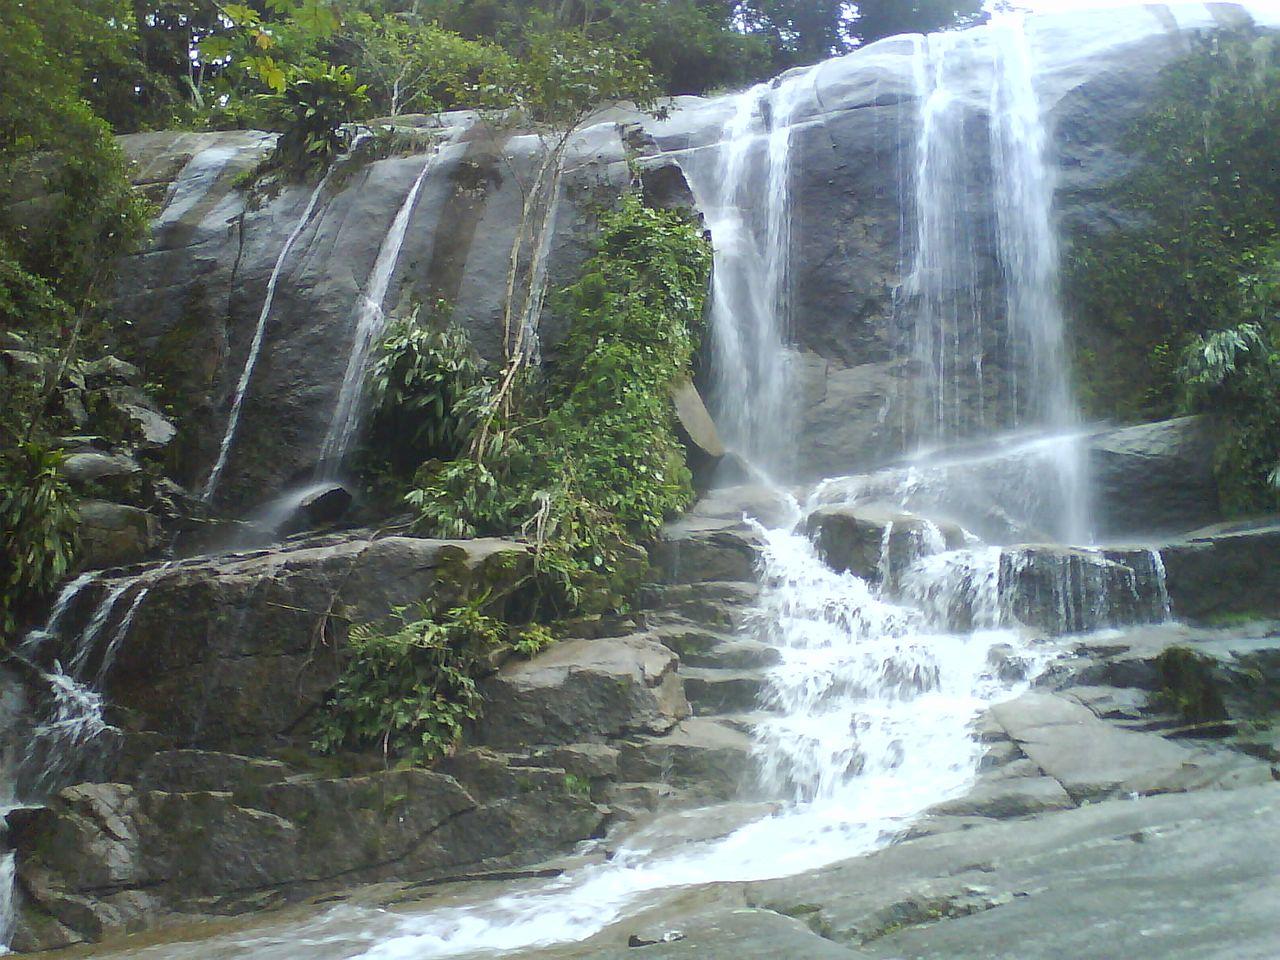 Cachoeiras em Ubatuba